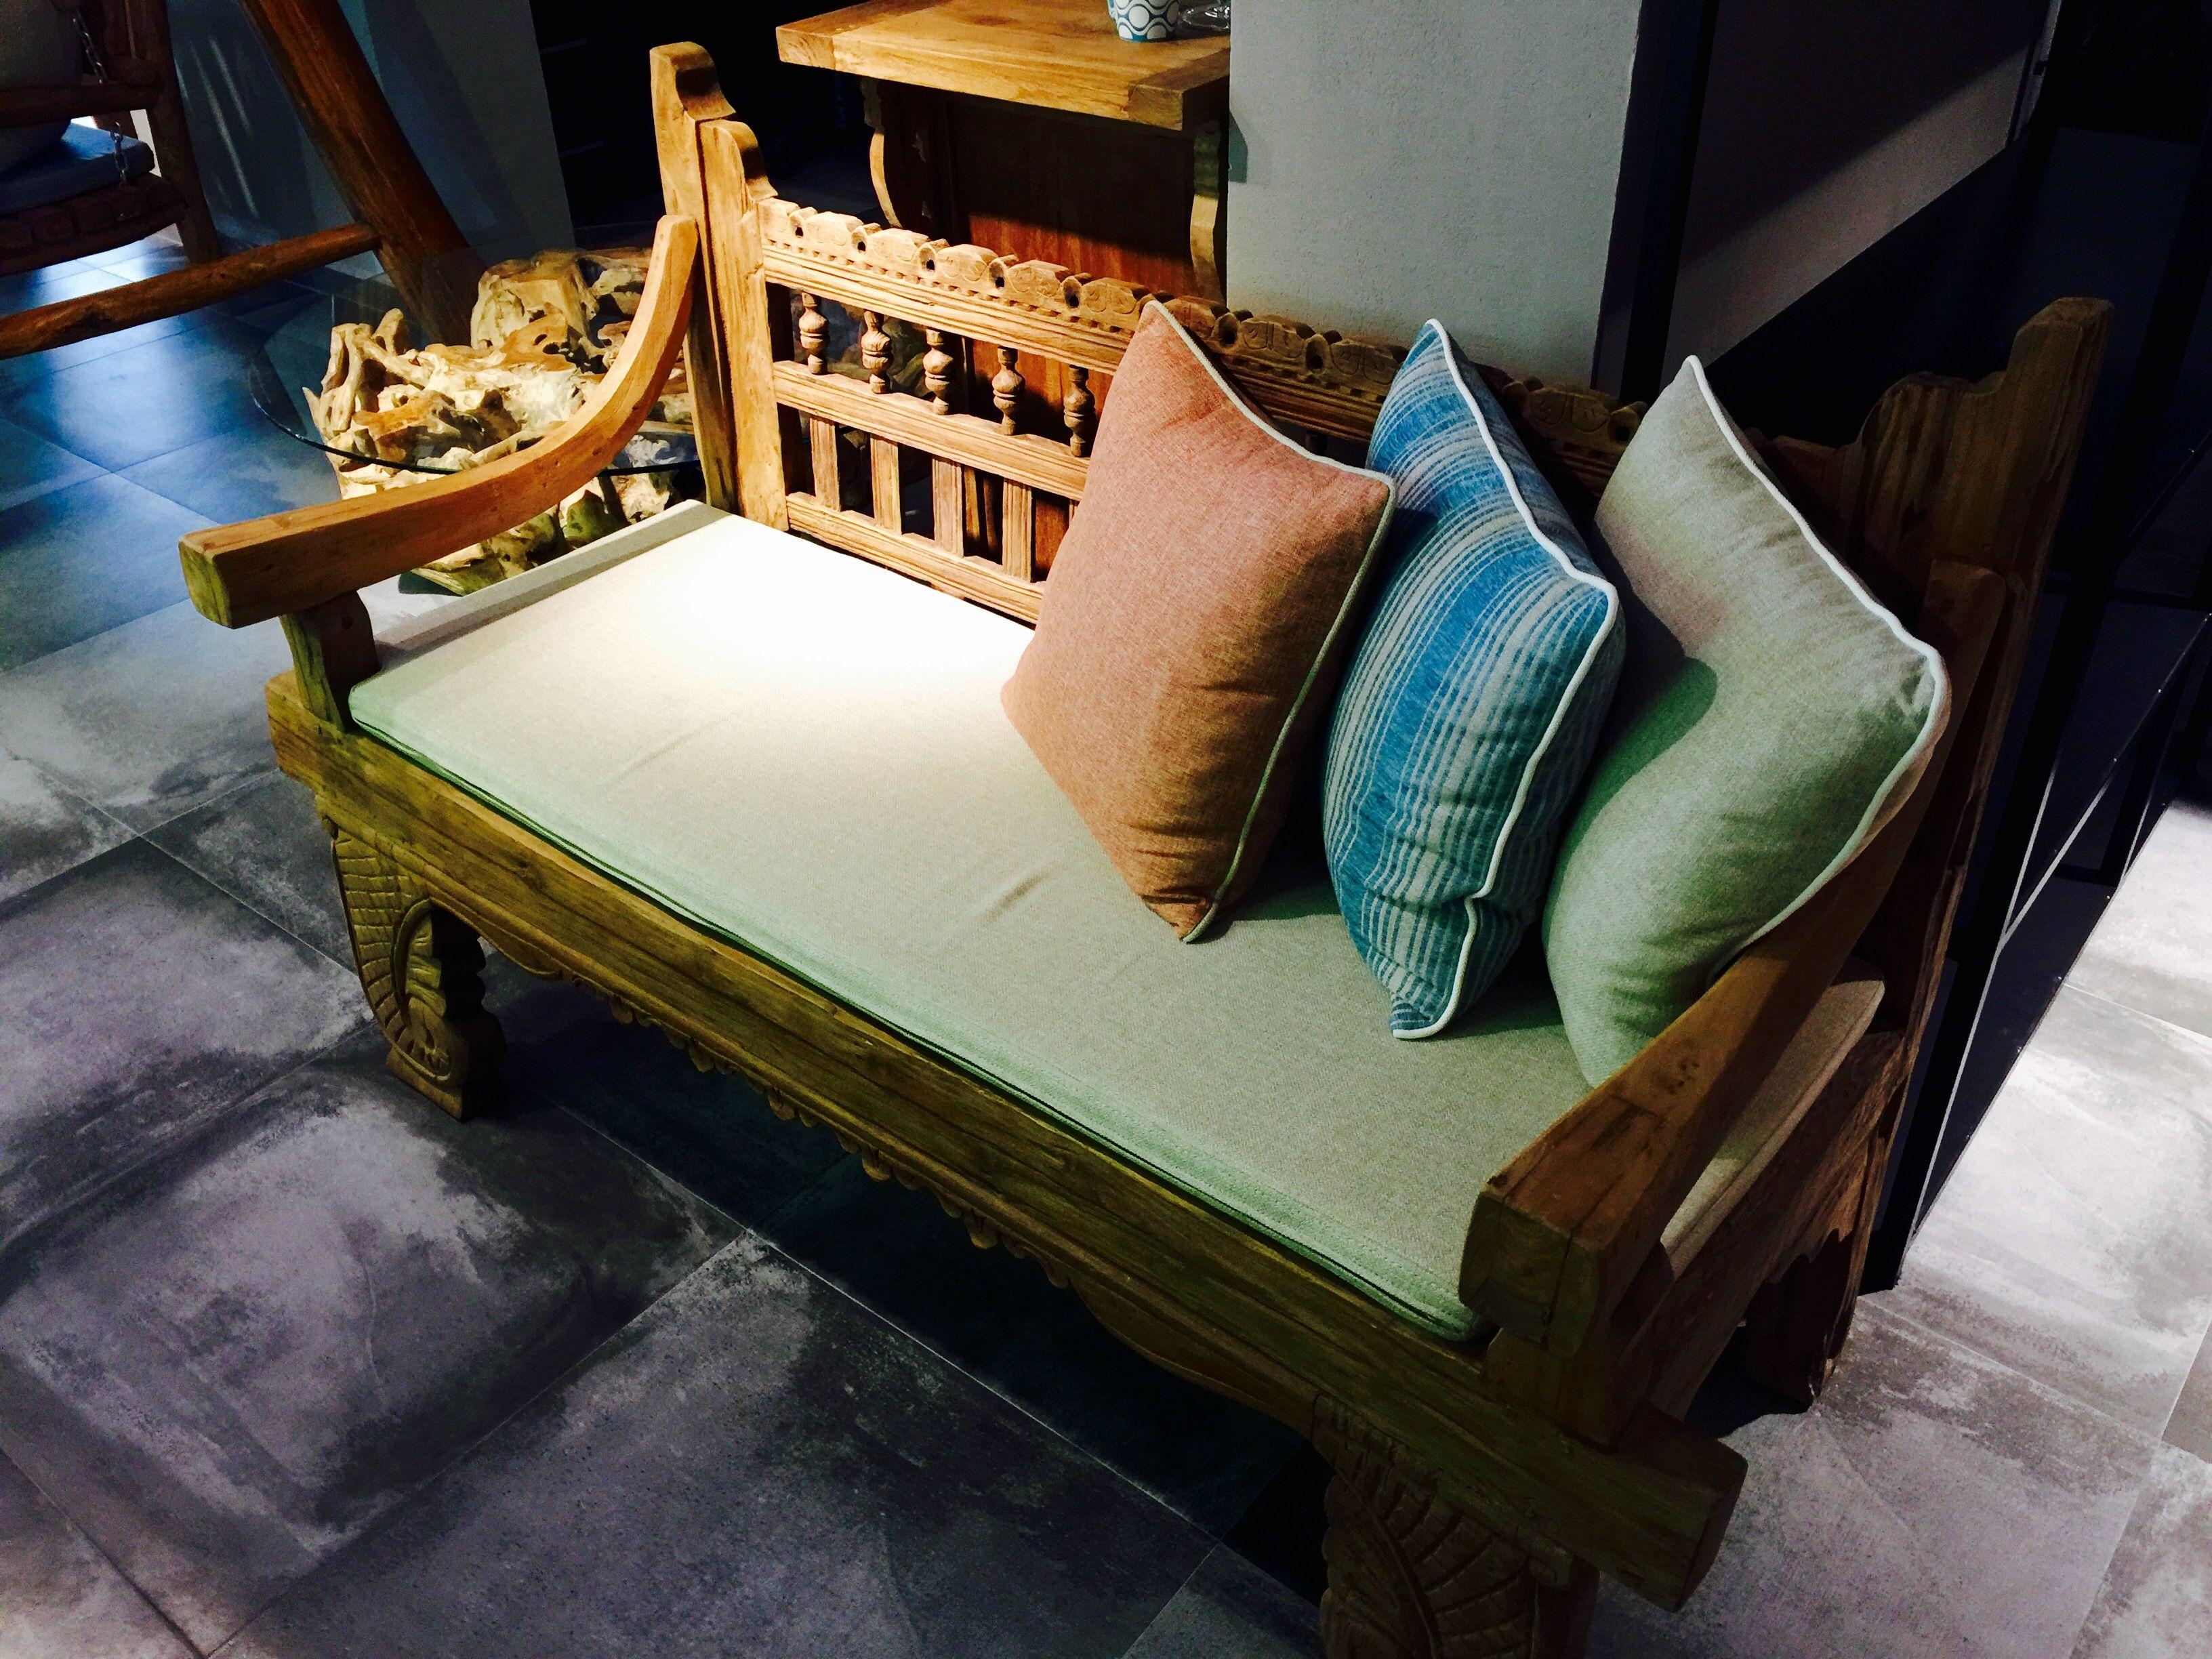 tik tasarim urunler tik teak agac masif masa sandalye dolap yatak aksesuar oturma grubu bahce mobilyasi masif agac dekor ev dekoru mobilya fikirleri